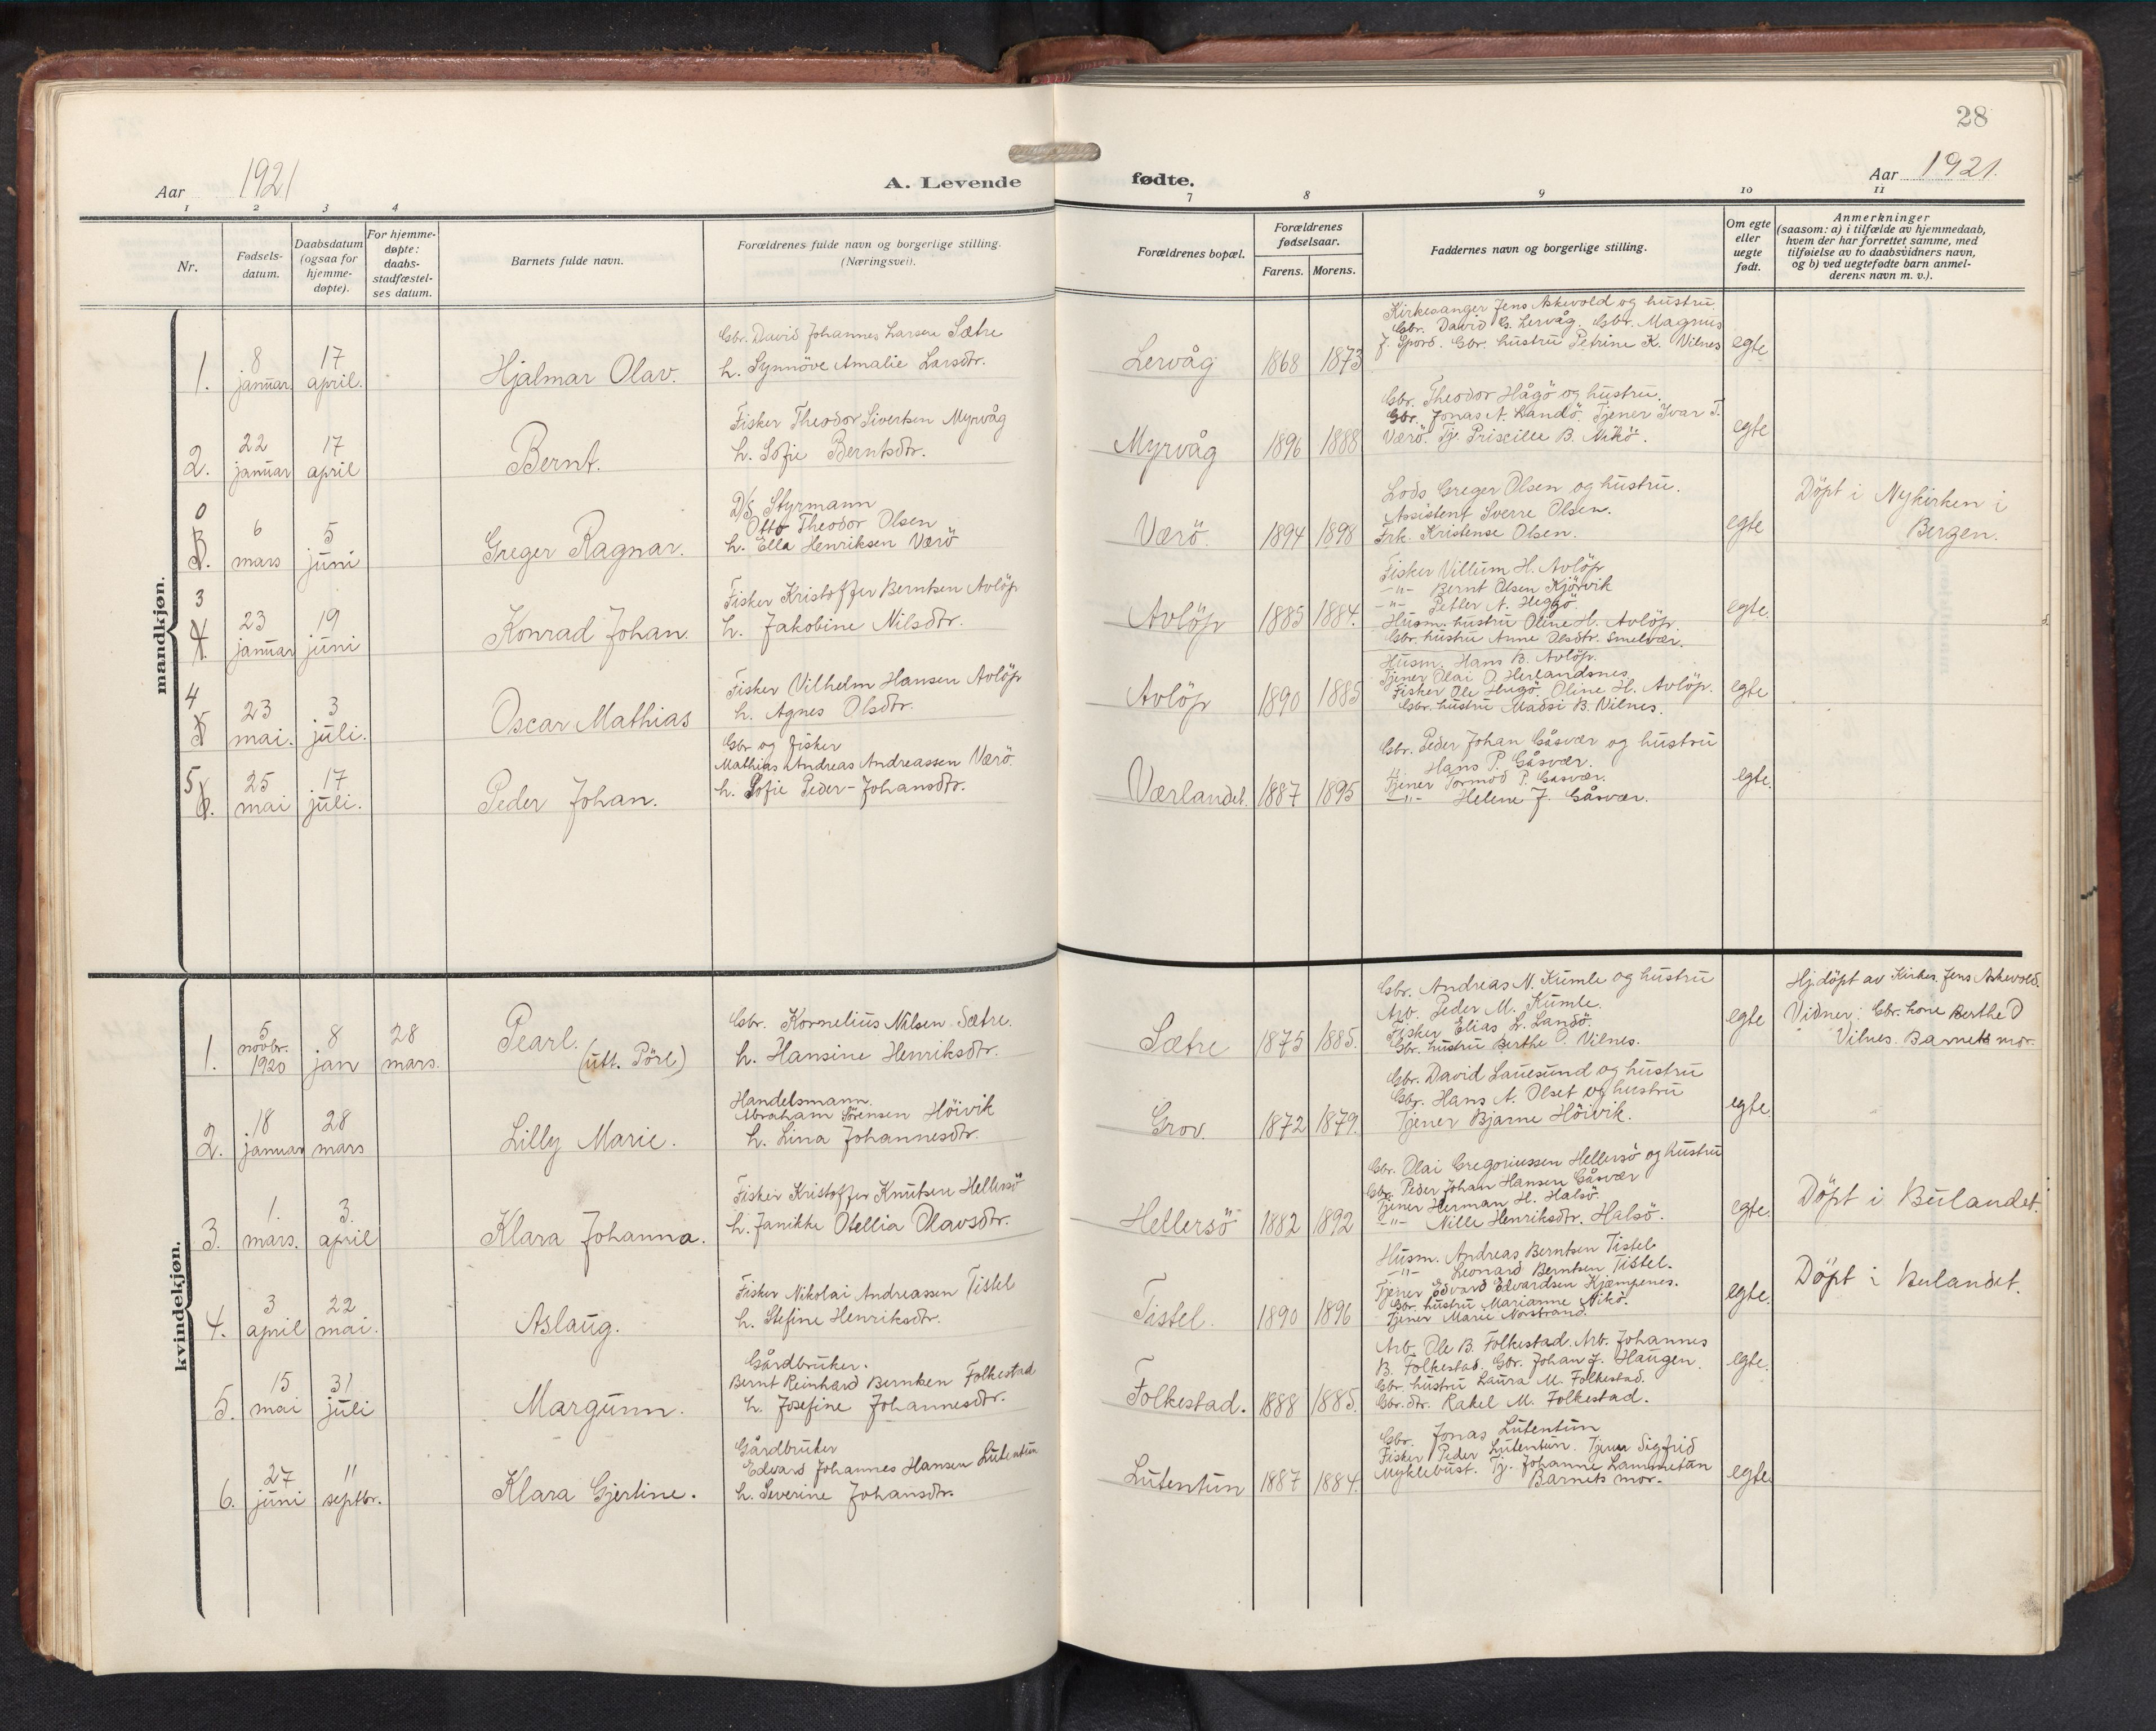 SAB, Askvoll sokneprestembete, H/Hab/Habb/L0002: Klokkerbok nr. B 2, 1910-1947, s. 27b-28a